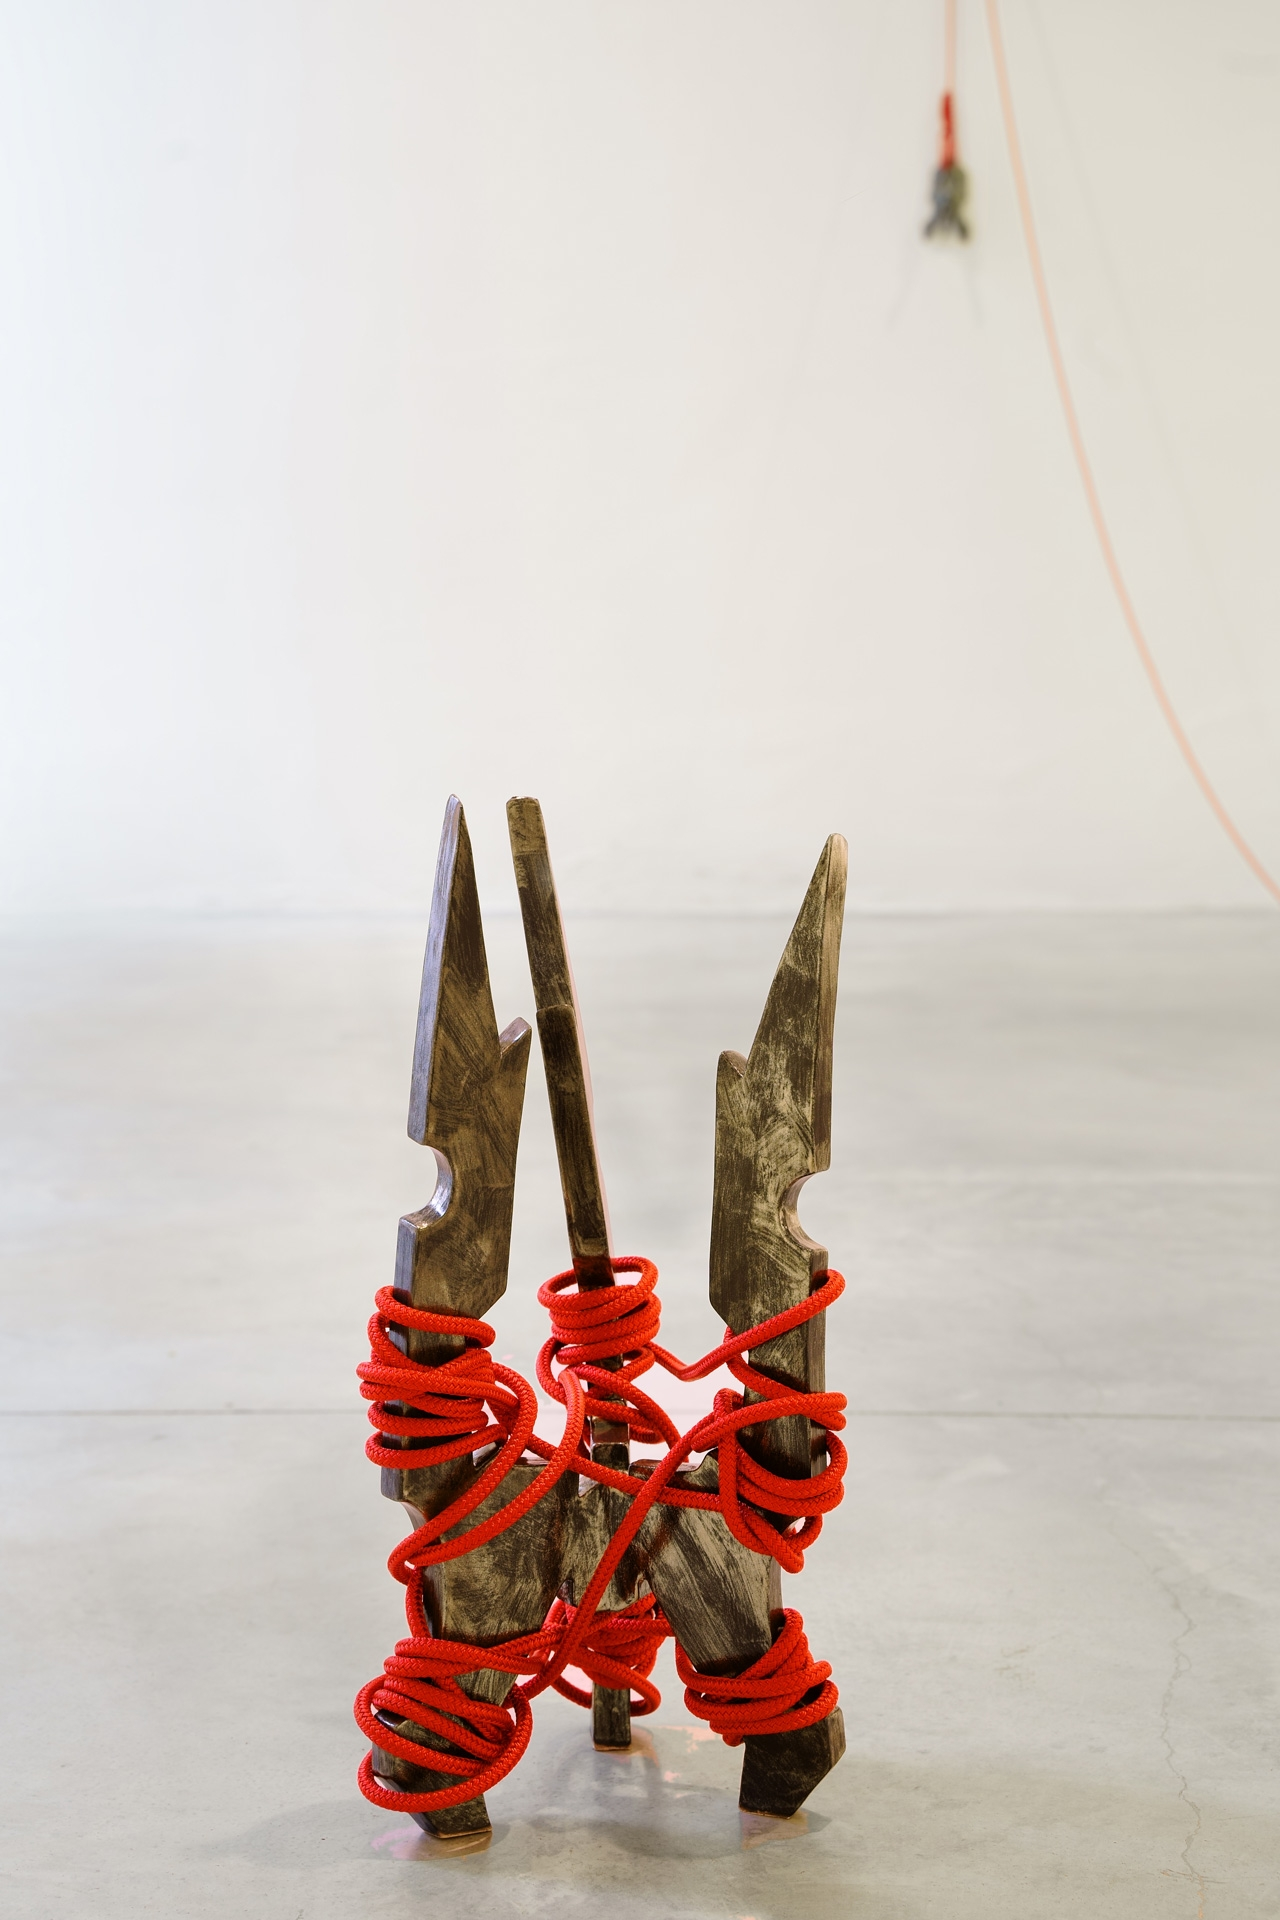 Timo Nasseri, Silverblack-Red, 2019, Glazed ceramics and rope, 50 x 21 x 21 cm